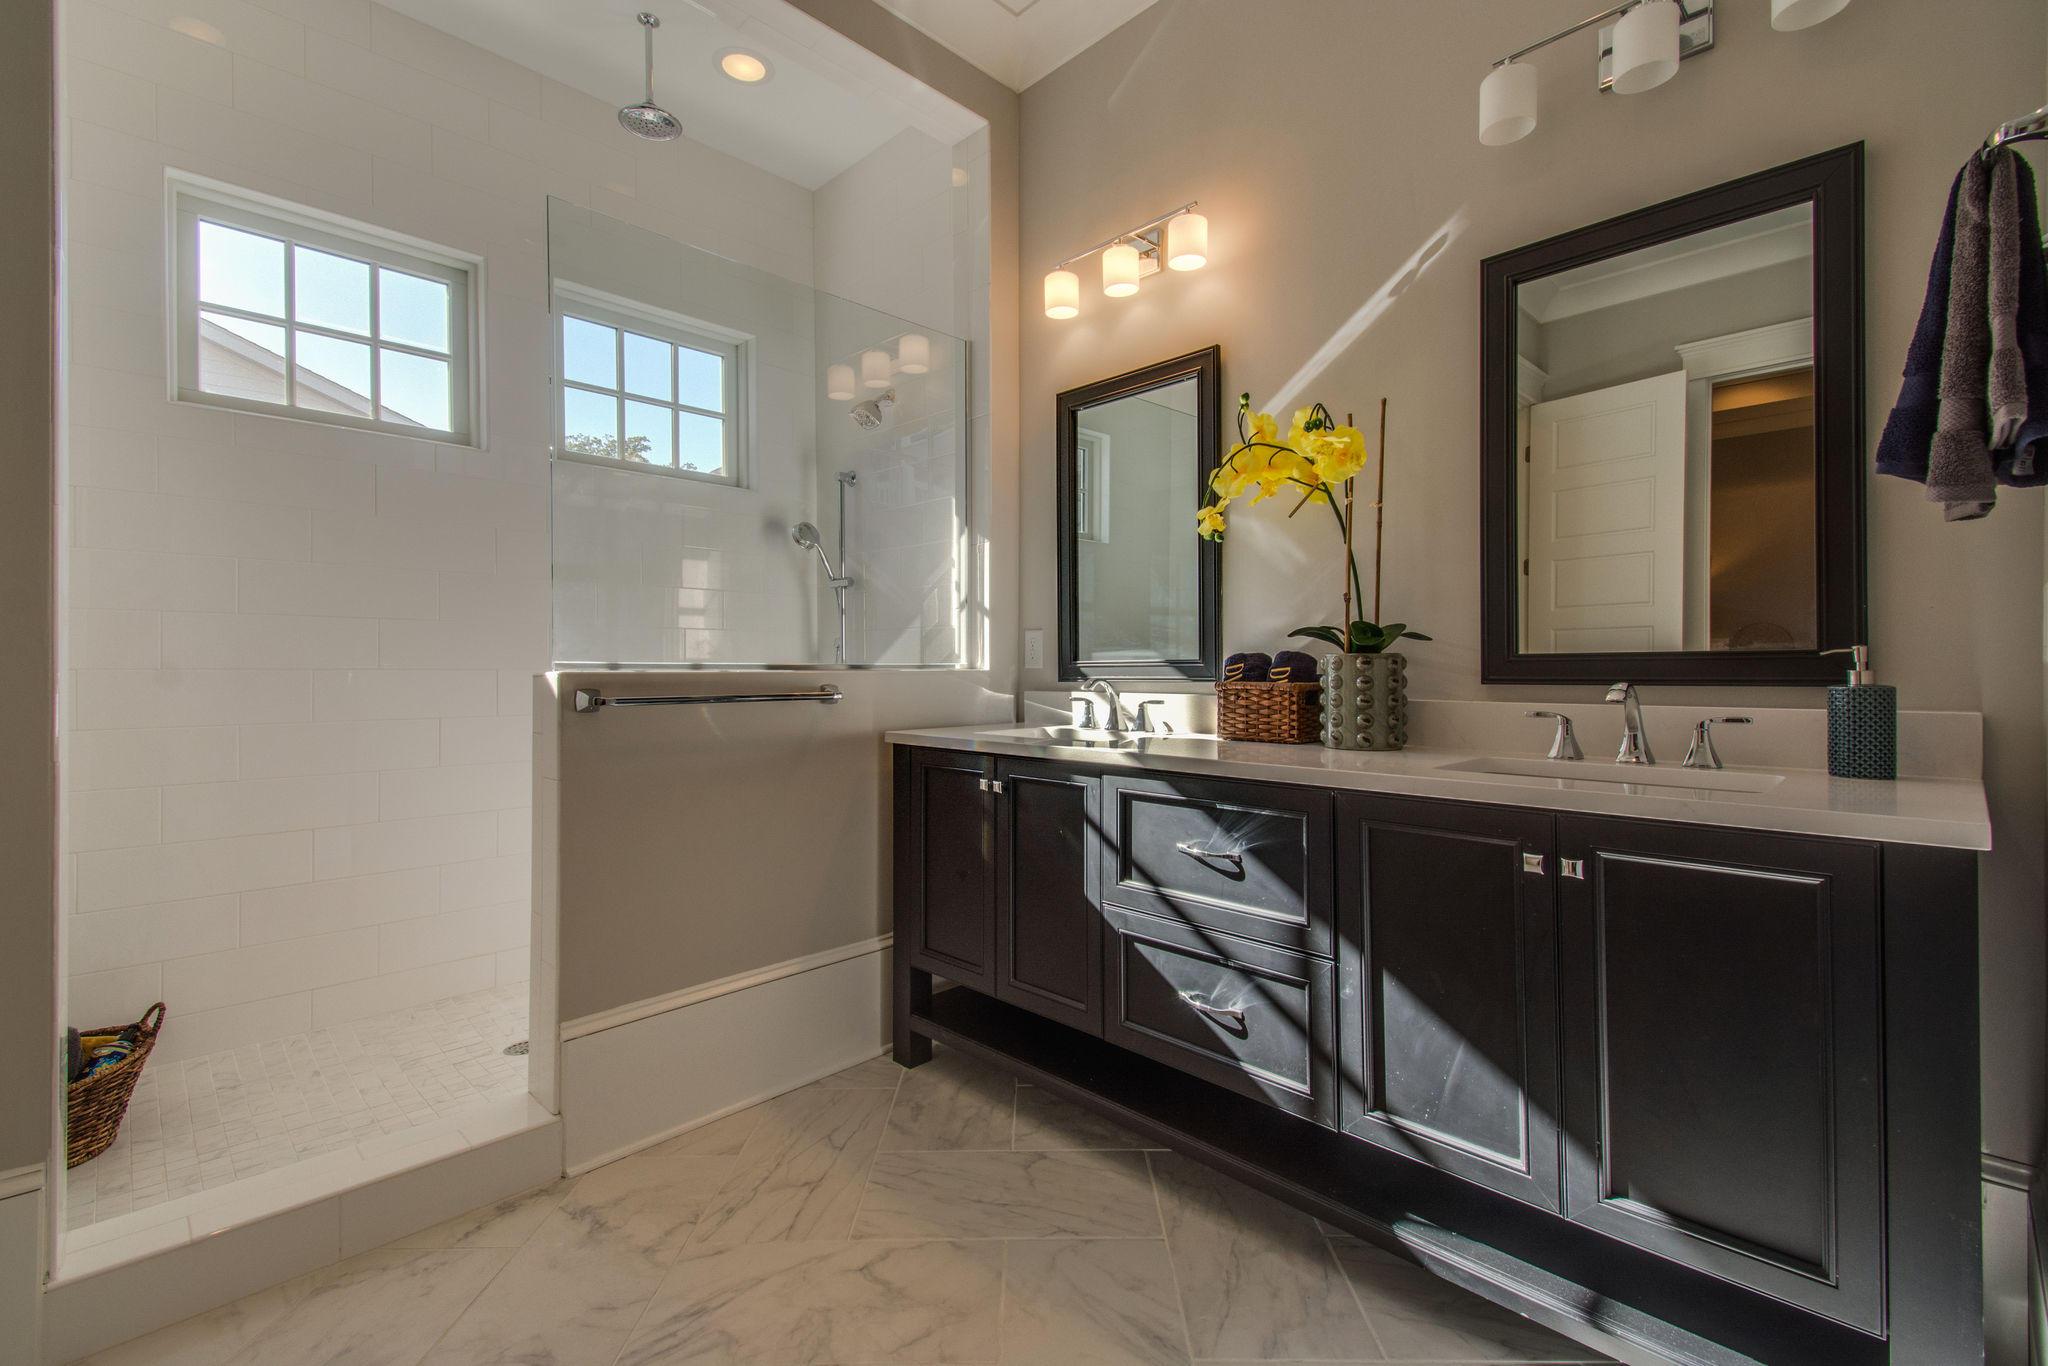 Daniel Island Park Homes For Sale - 112 Brailsford, Charleston, SC - 15